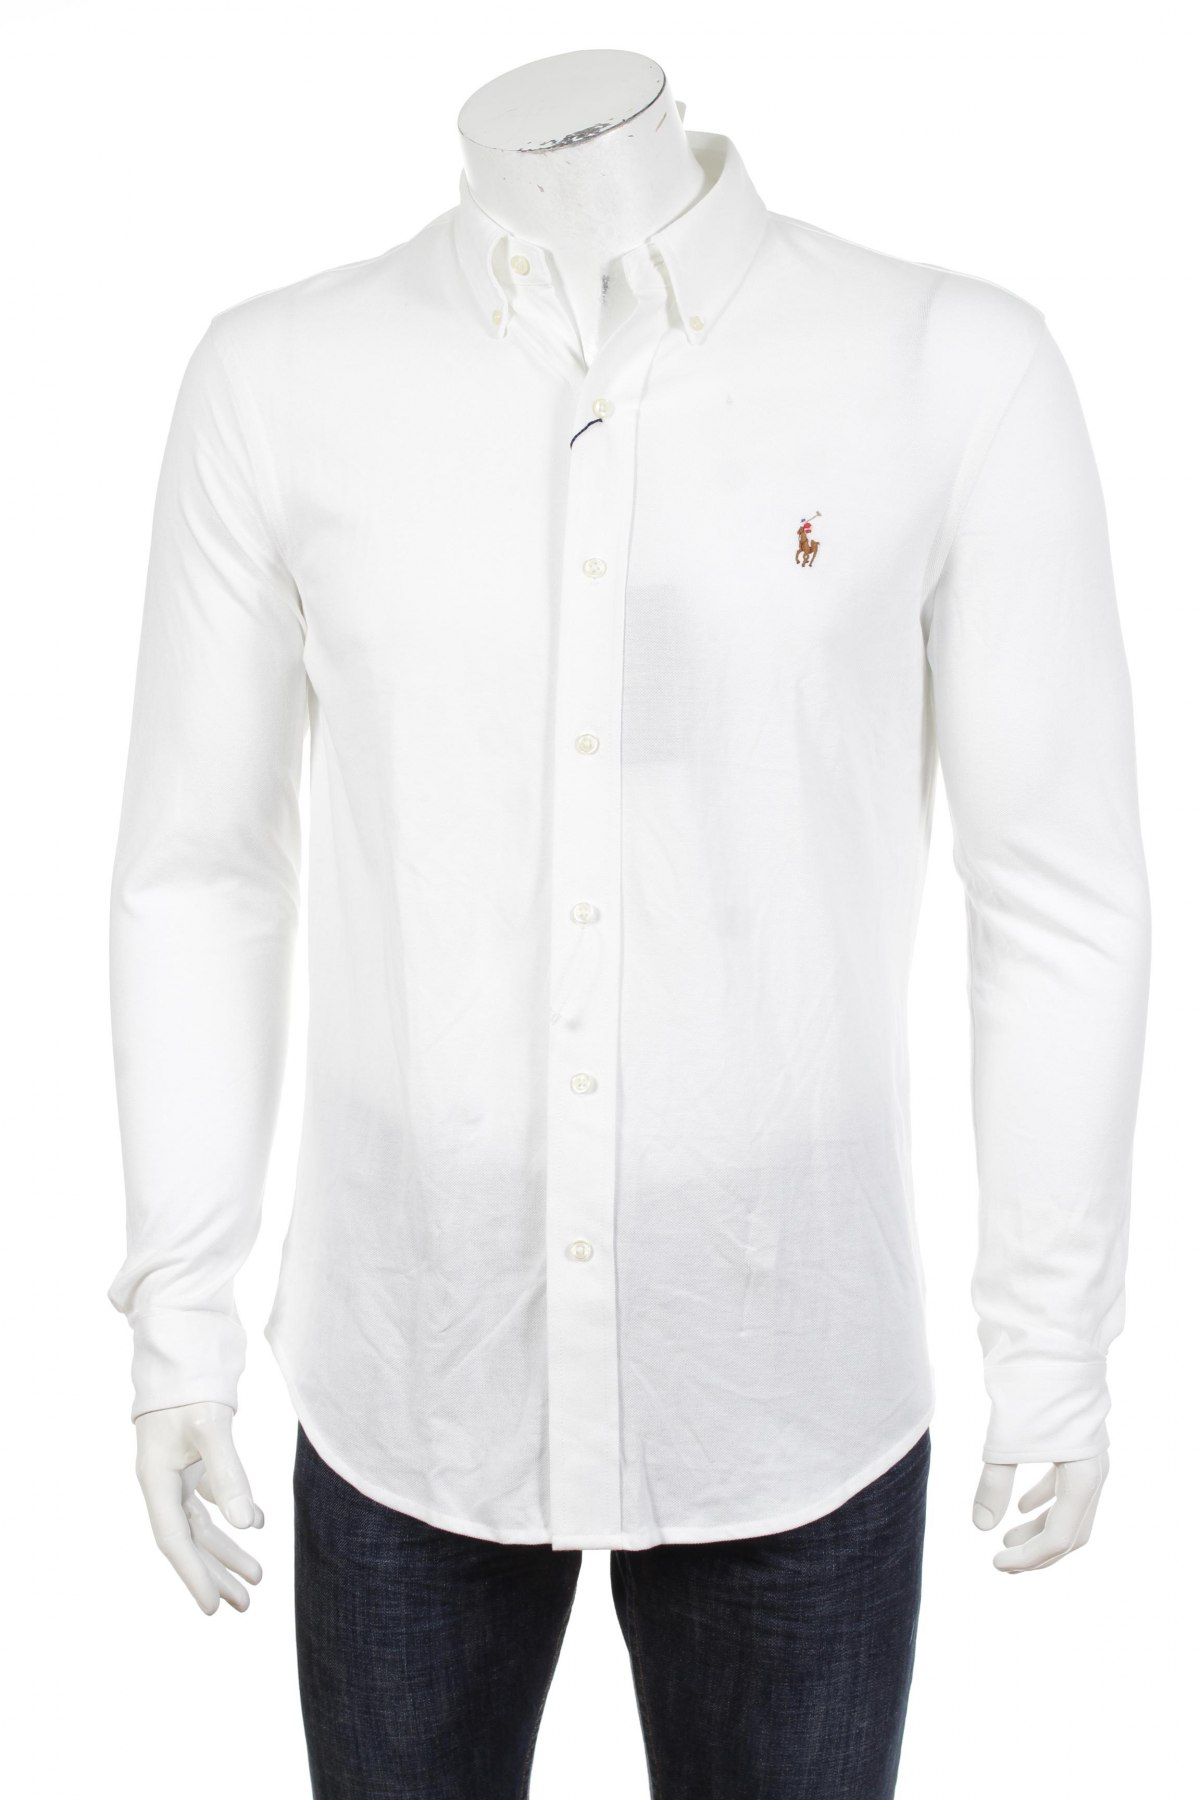 All White Ralph Lauren